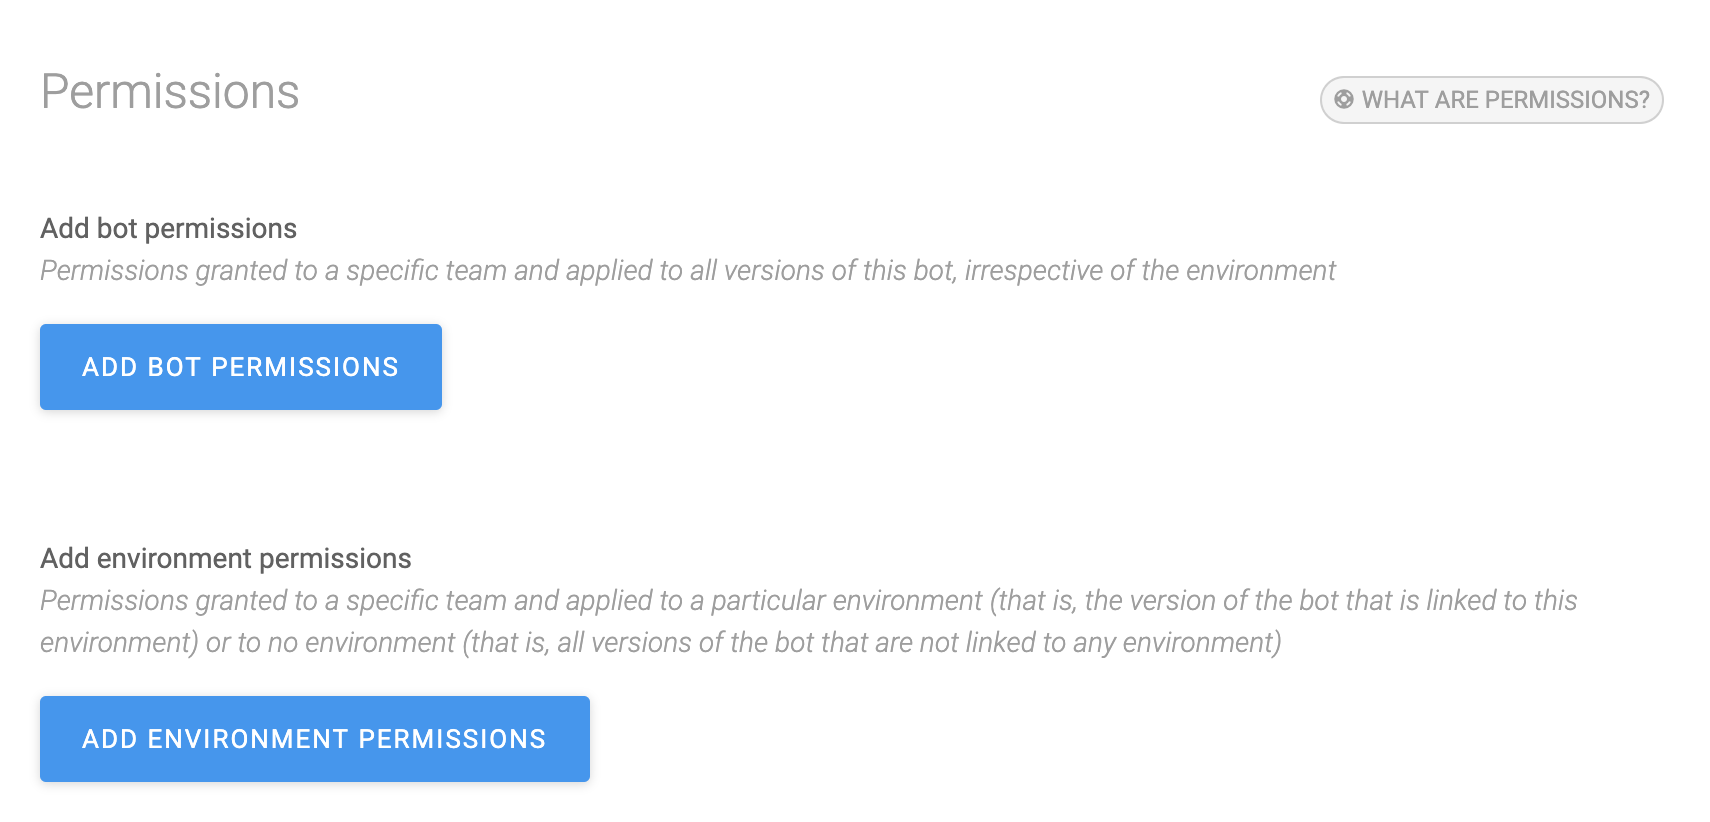 SAP Conversational AI organization_permissions